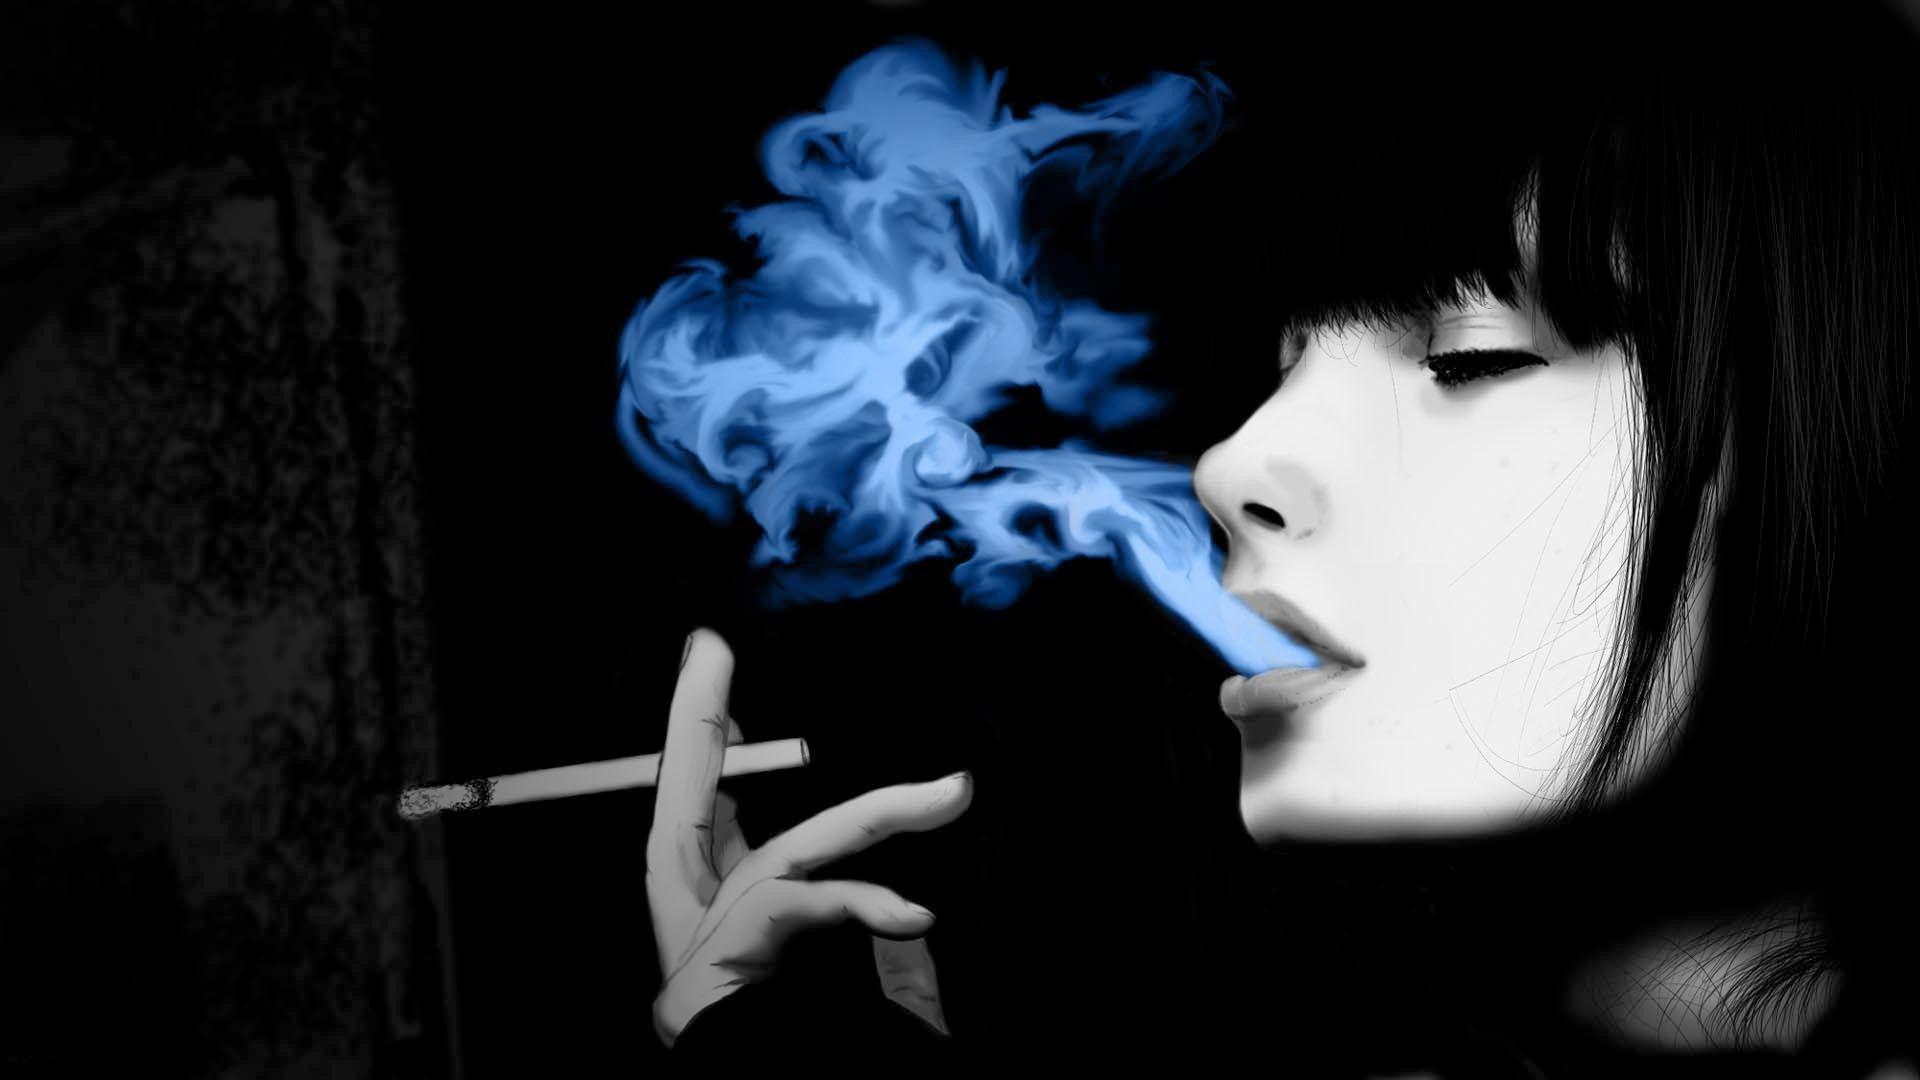 Smoking Hd Wallpapers Wallpaper Cave